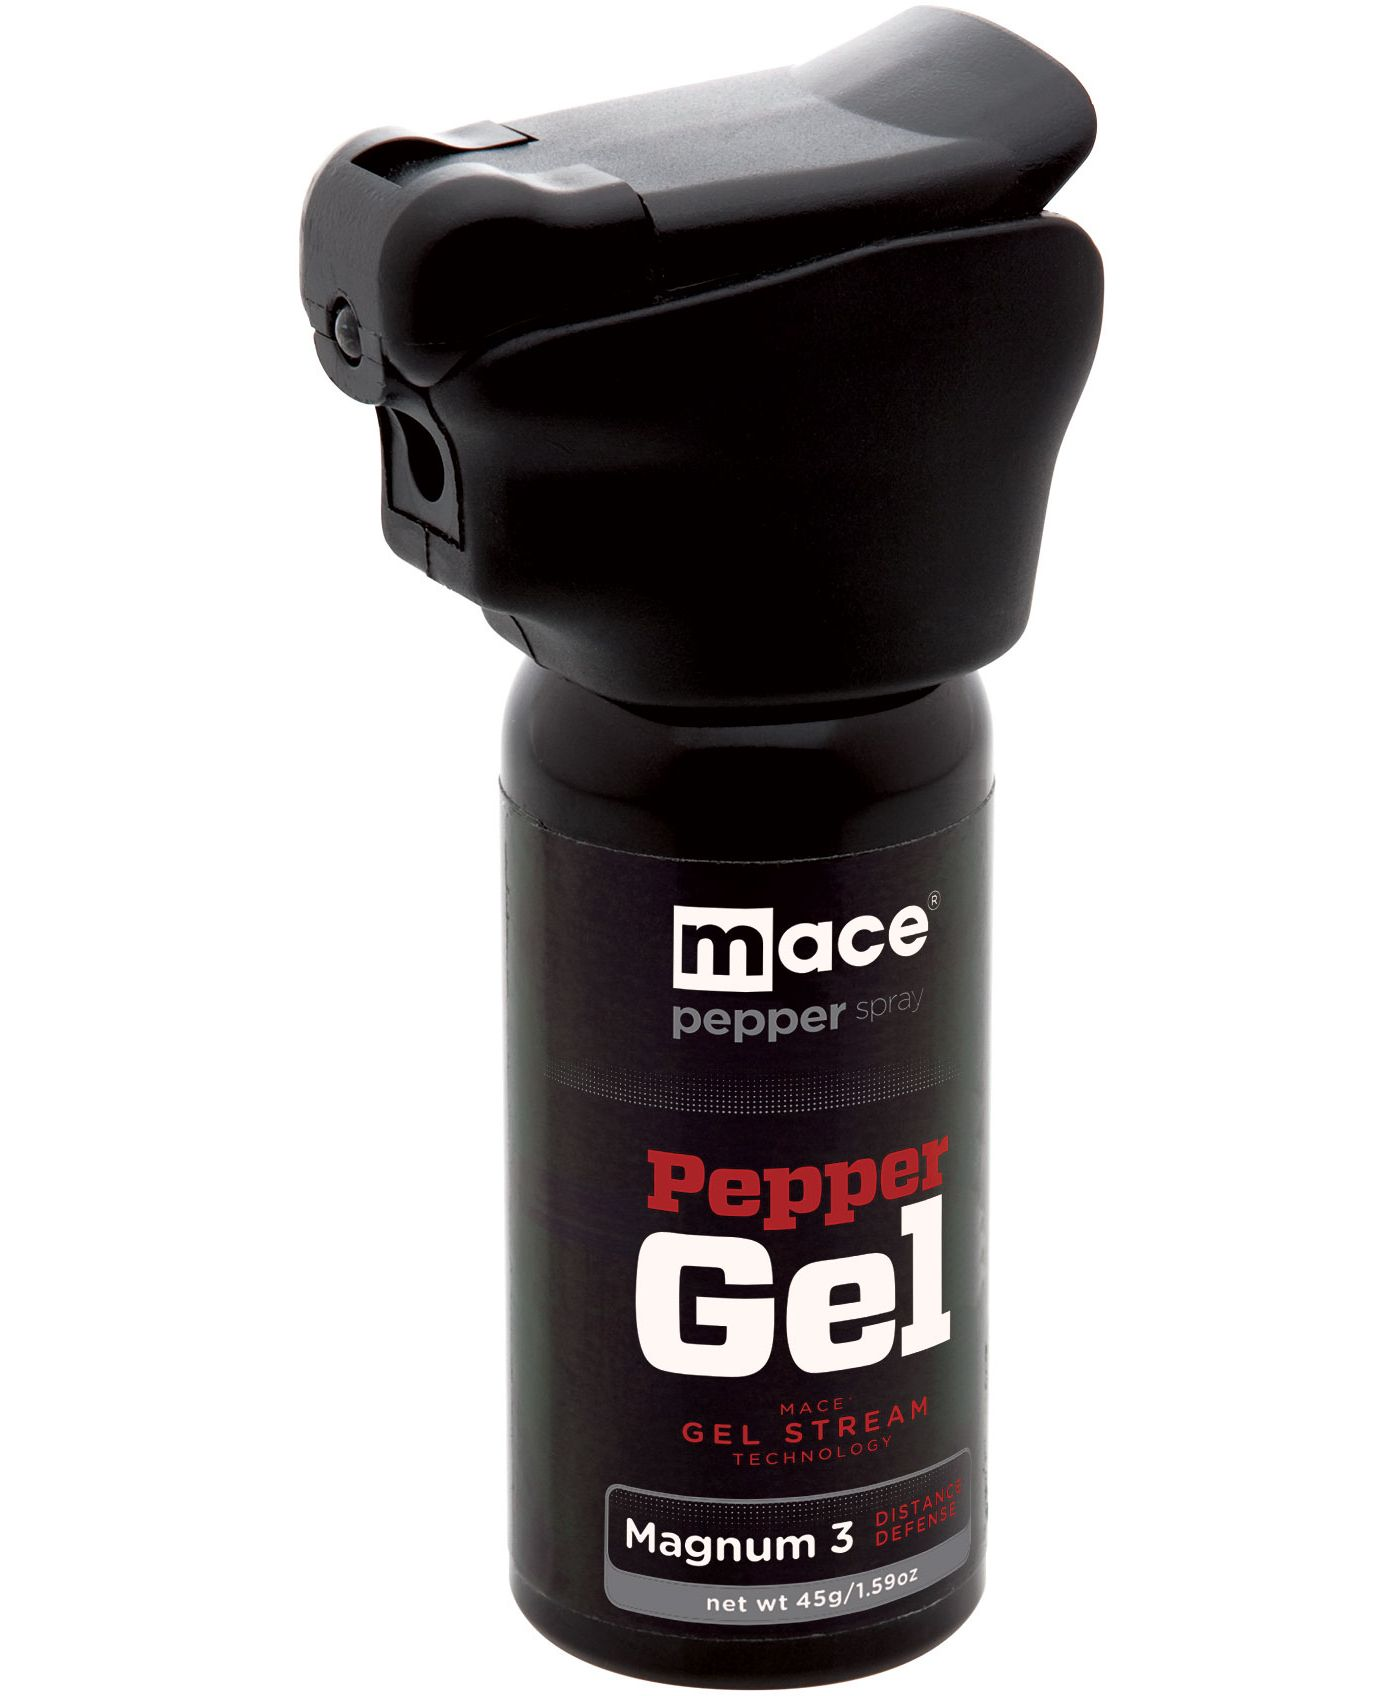 Mace Brand Night Defender Distance Defense Pepper Gel Spray